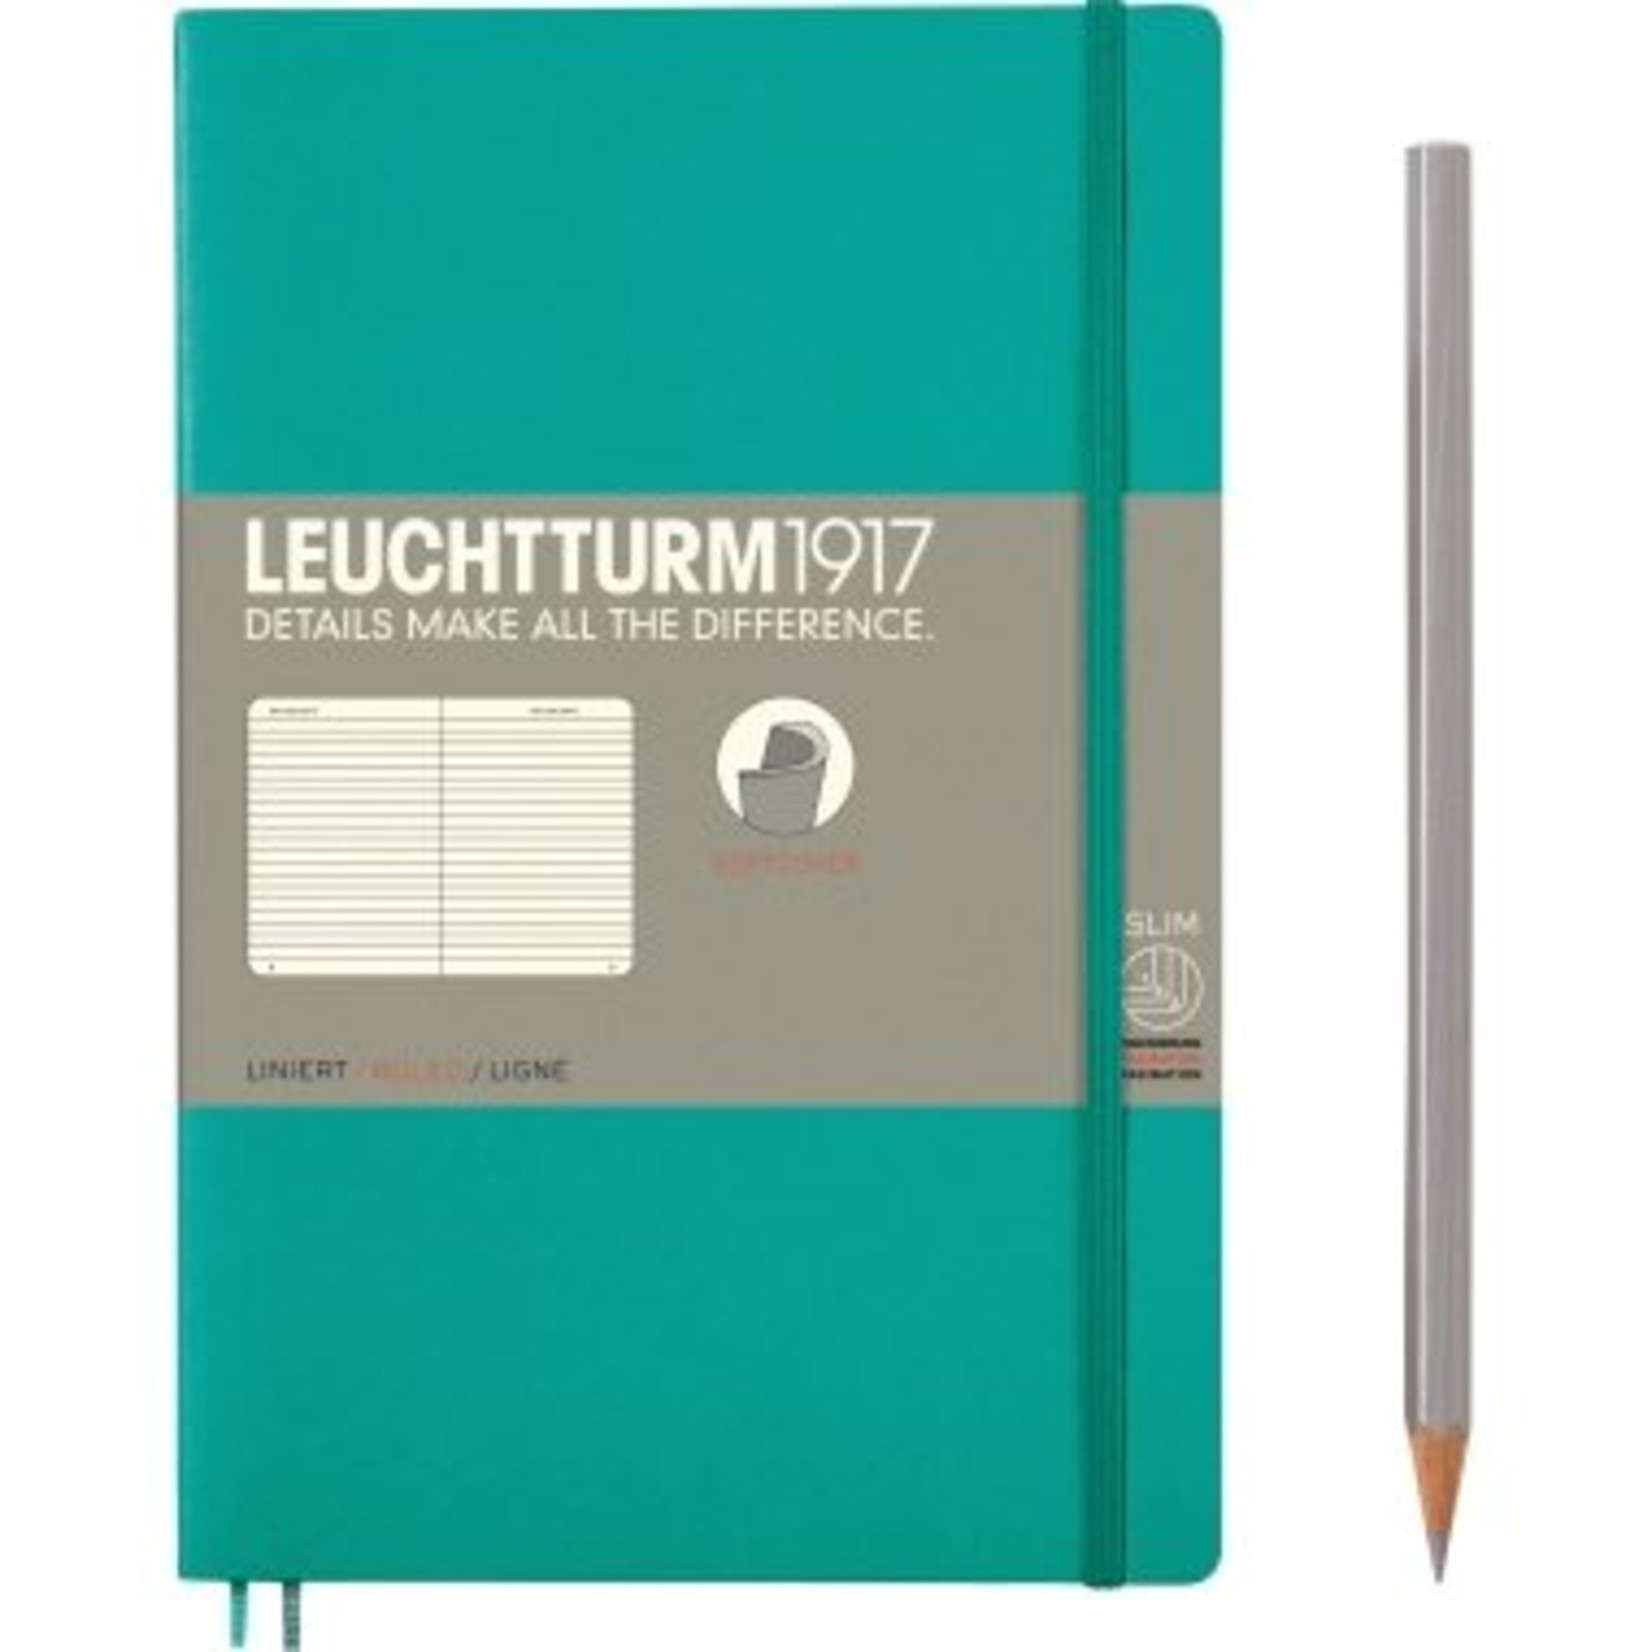 Leuchtturm1917 LT NB B6 SC Paperback Smaragd Liniert